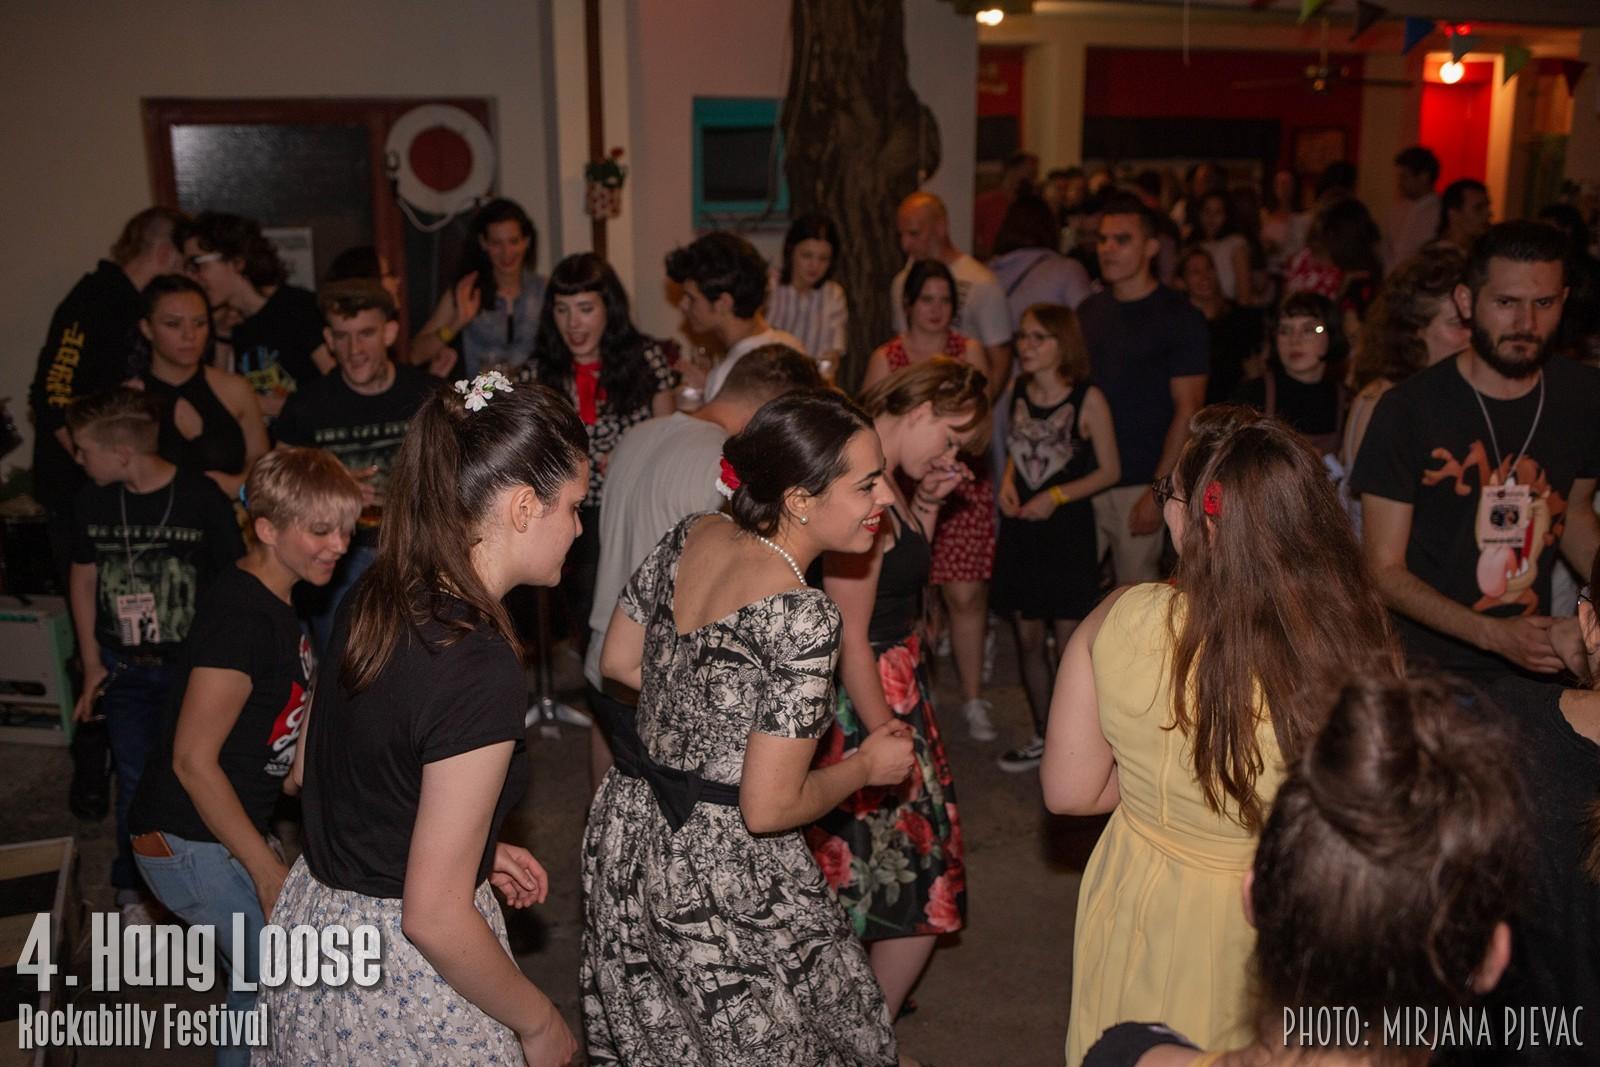 4. Hang Loose Rockabilly Festival Vinkovci, Croatia, photo: Mirjana Pjevac